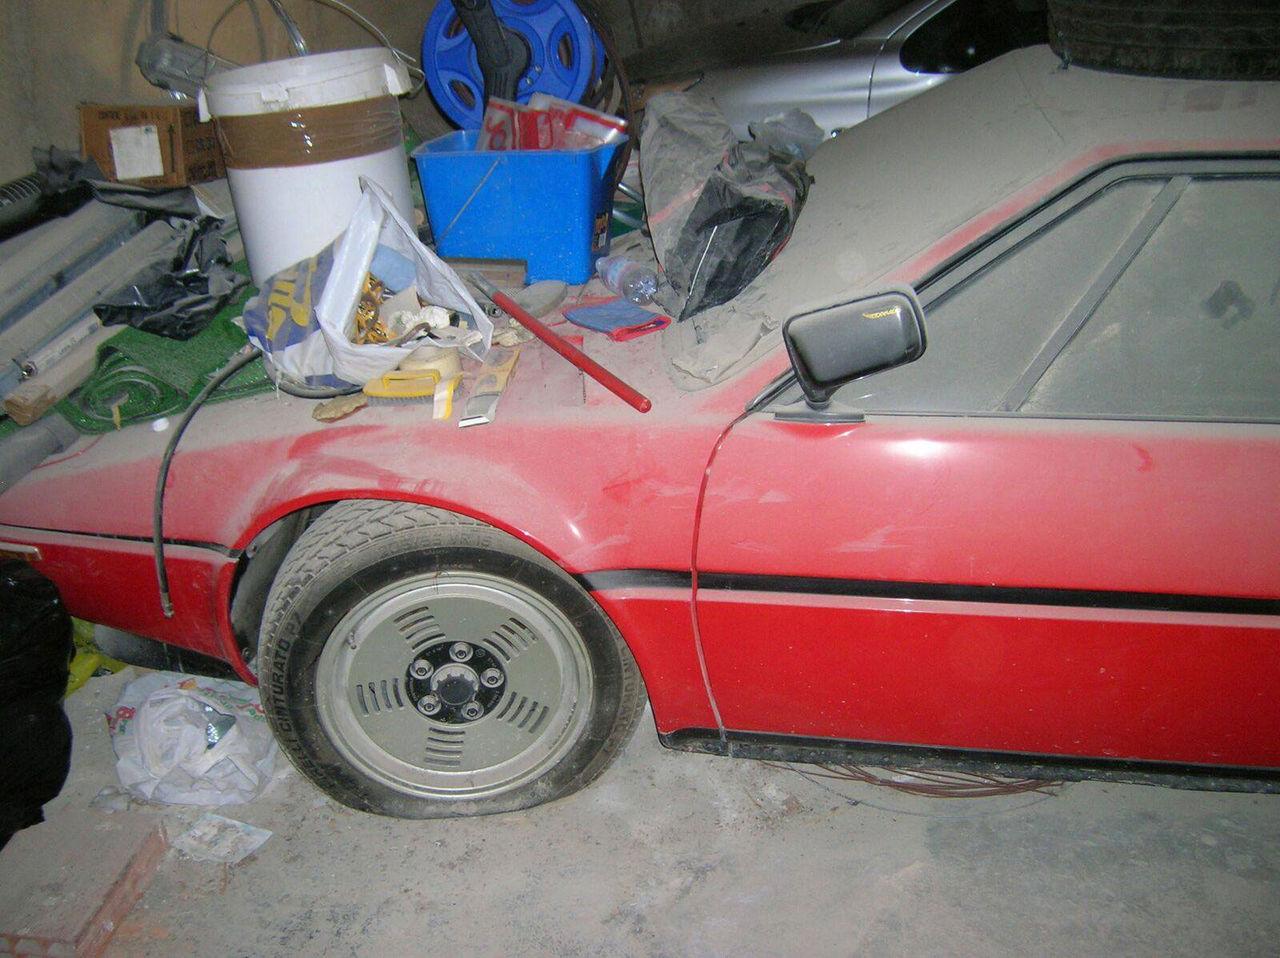 Klassisk BMW M1 hittad i lada